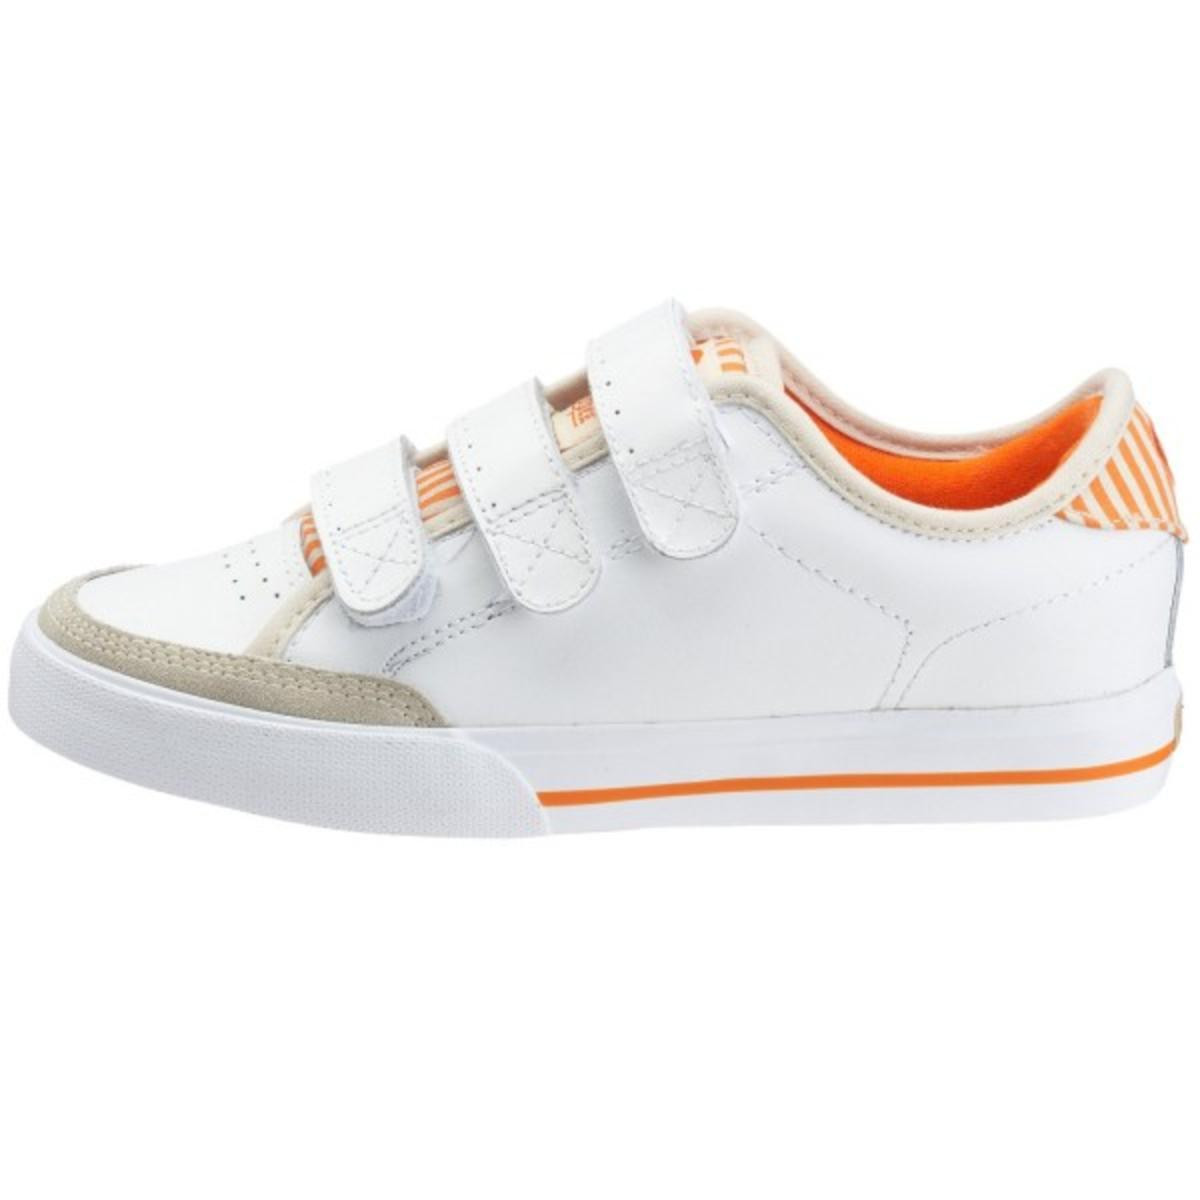 Circa Skateboard Schuhe-ALW50V-- Weiß Orange Cream Stripes